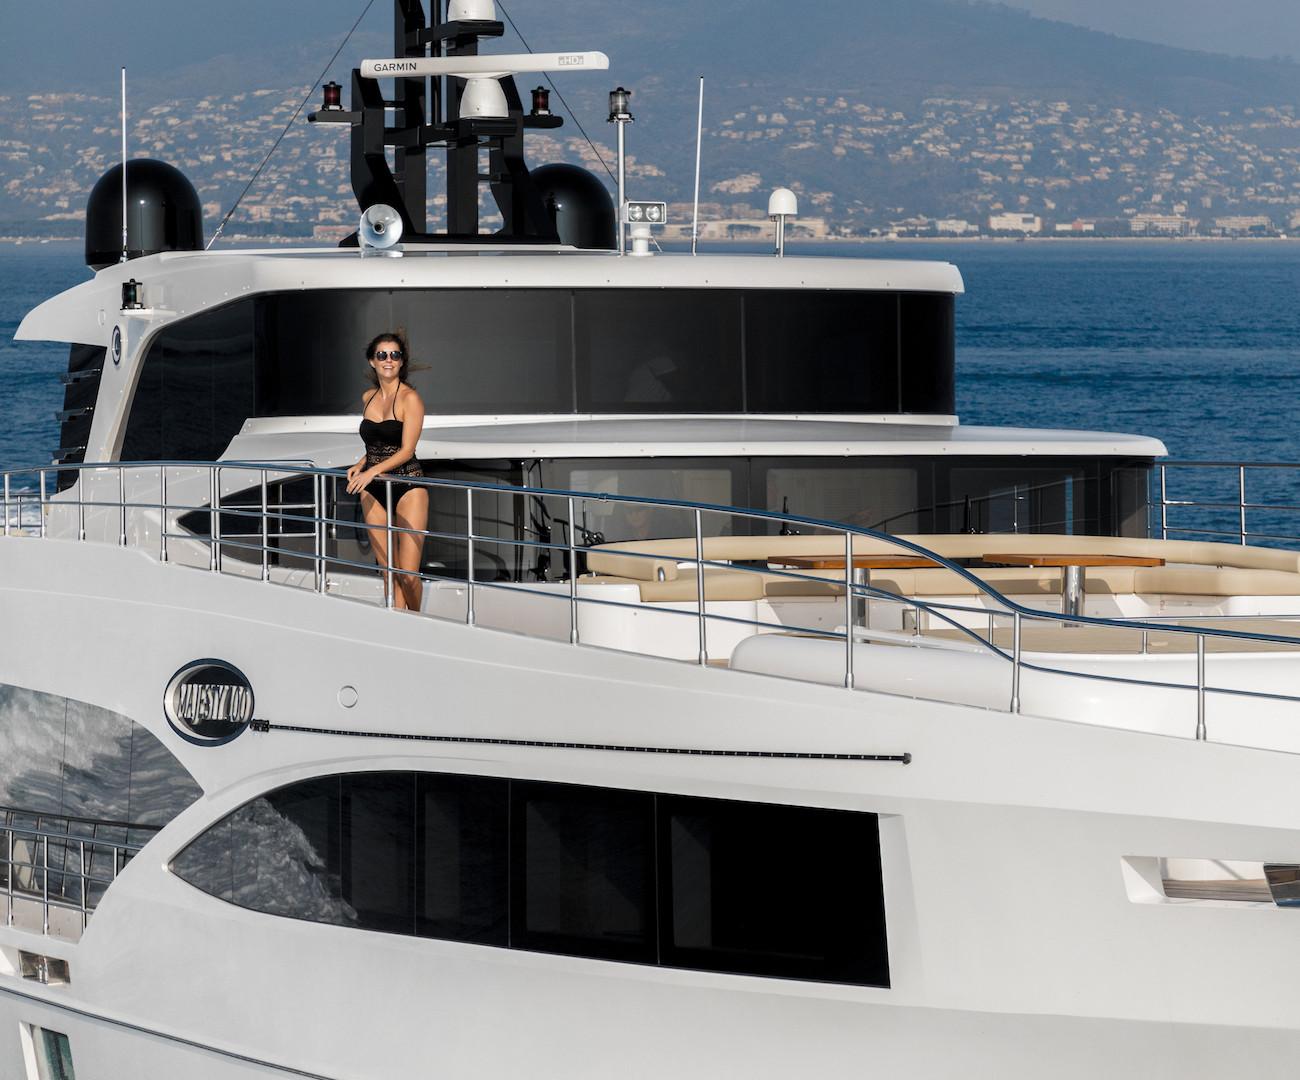 Yacht MIA - on charter, underway